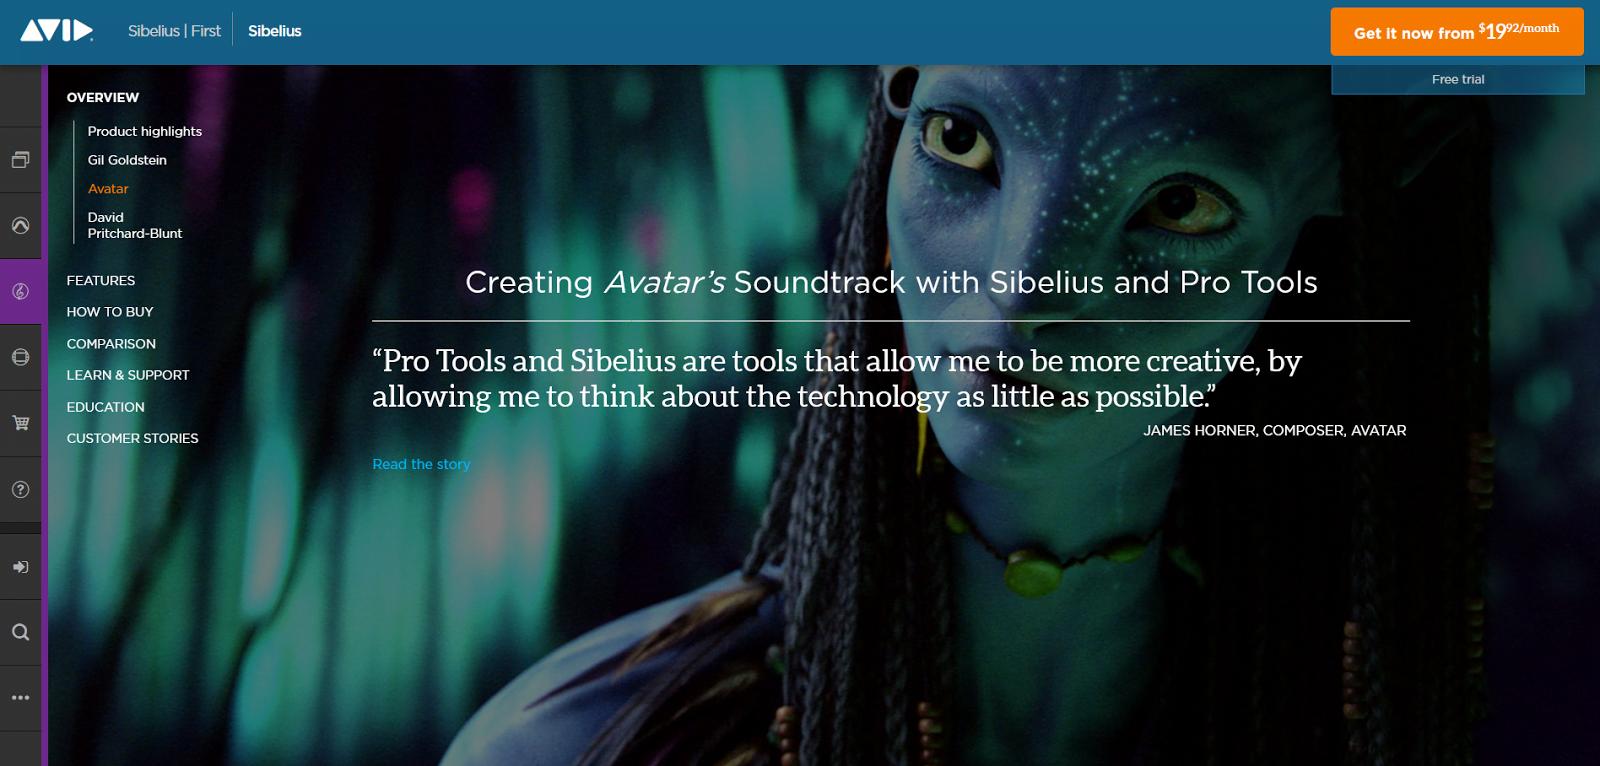 Avid Sibelius Software Home Page Avatar Screen Grab